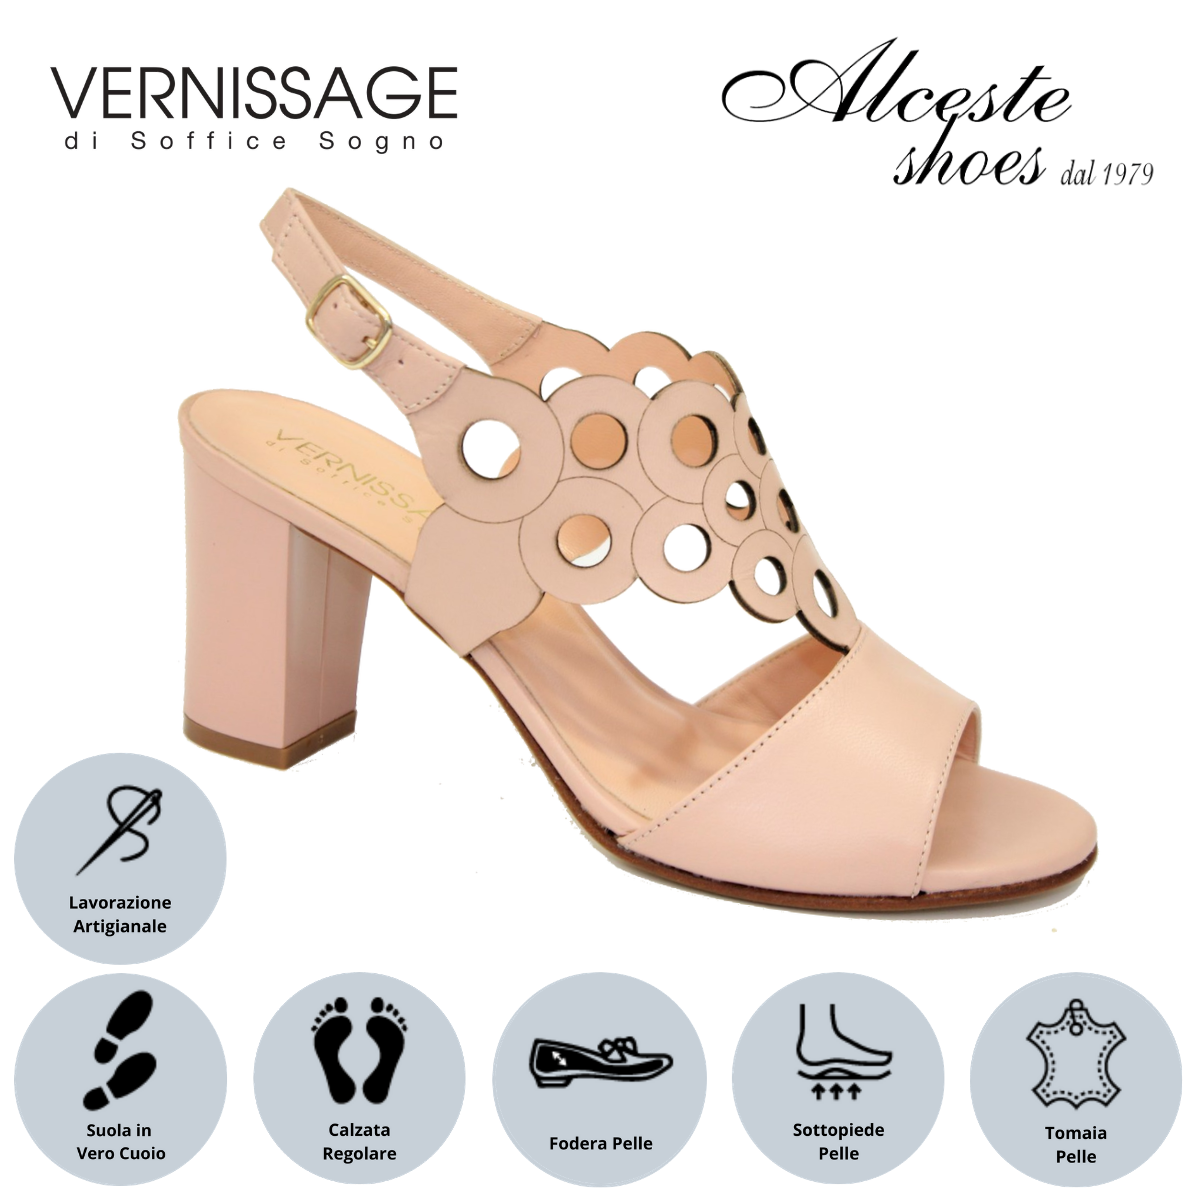 "Sandalo Cerimonia ""Soffice Sogno"" Art. 20132 Pelle Cipria Alceste Shoes 7 2"